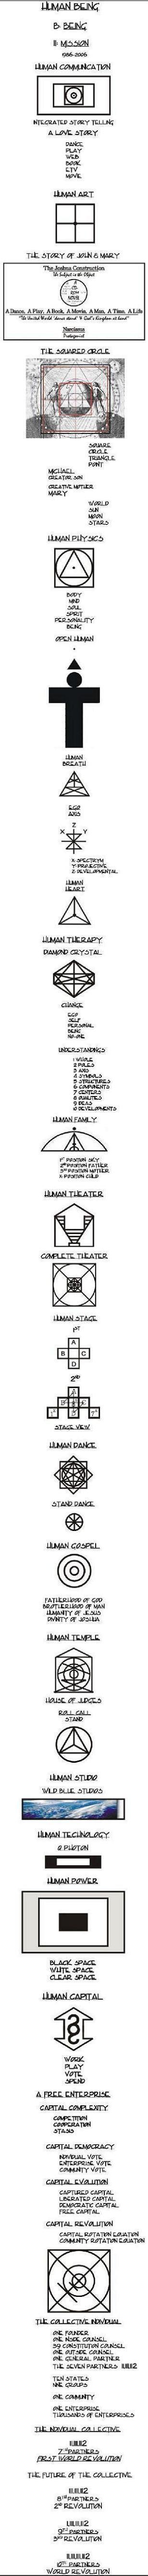 Human_mission_2